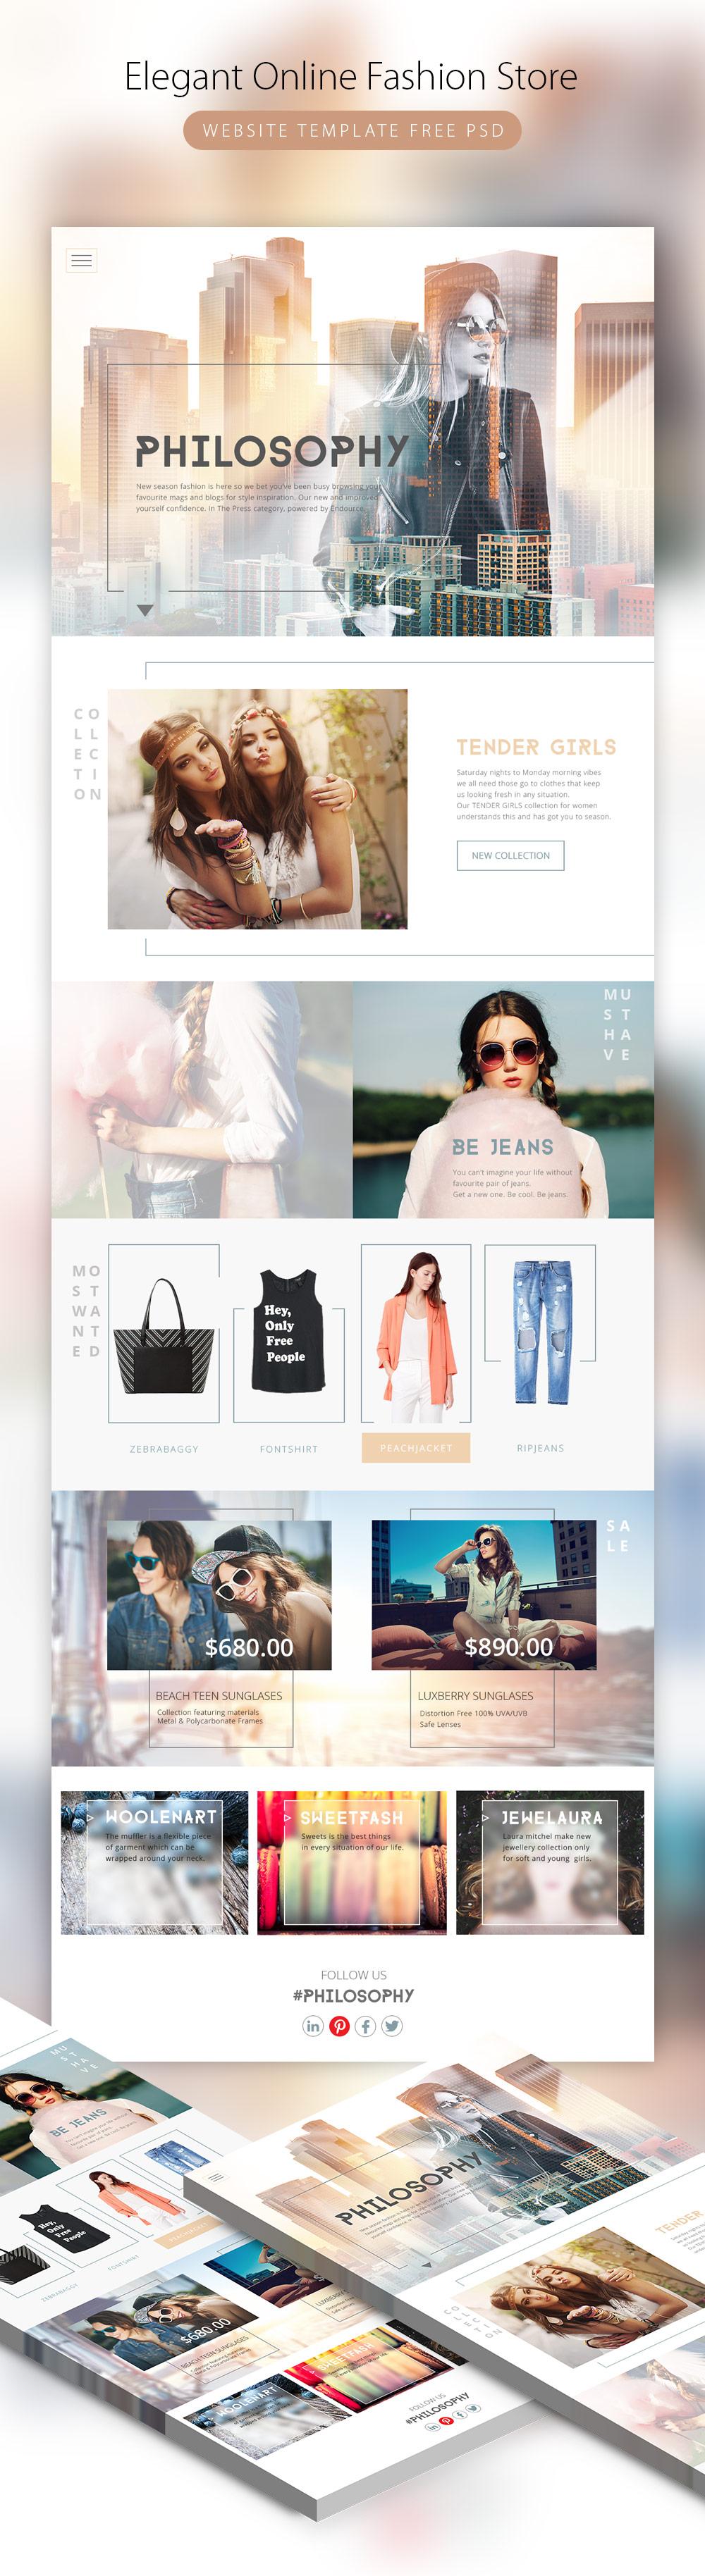 Online fashion design websites 92